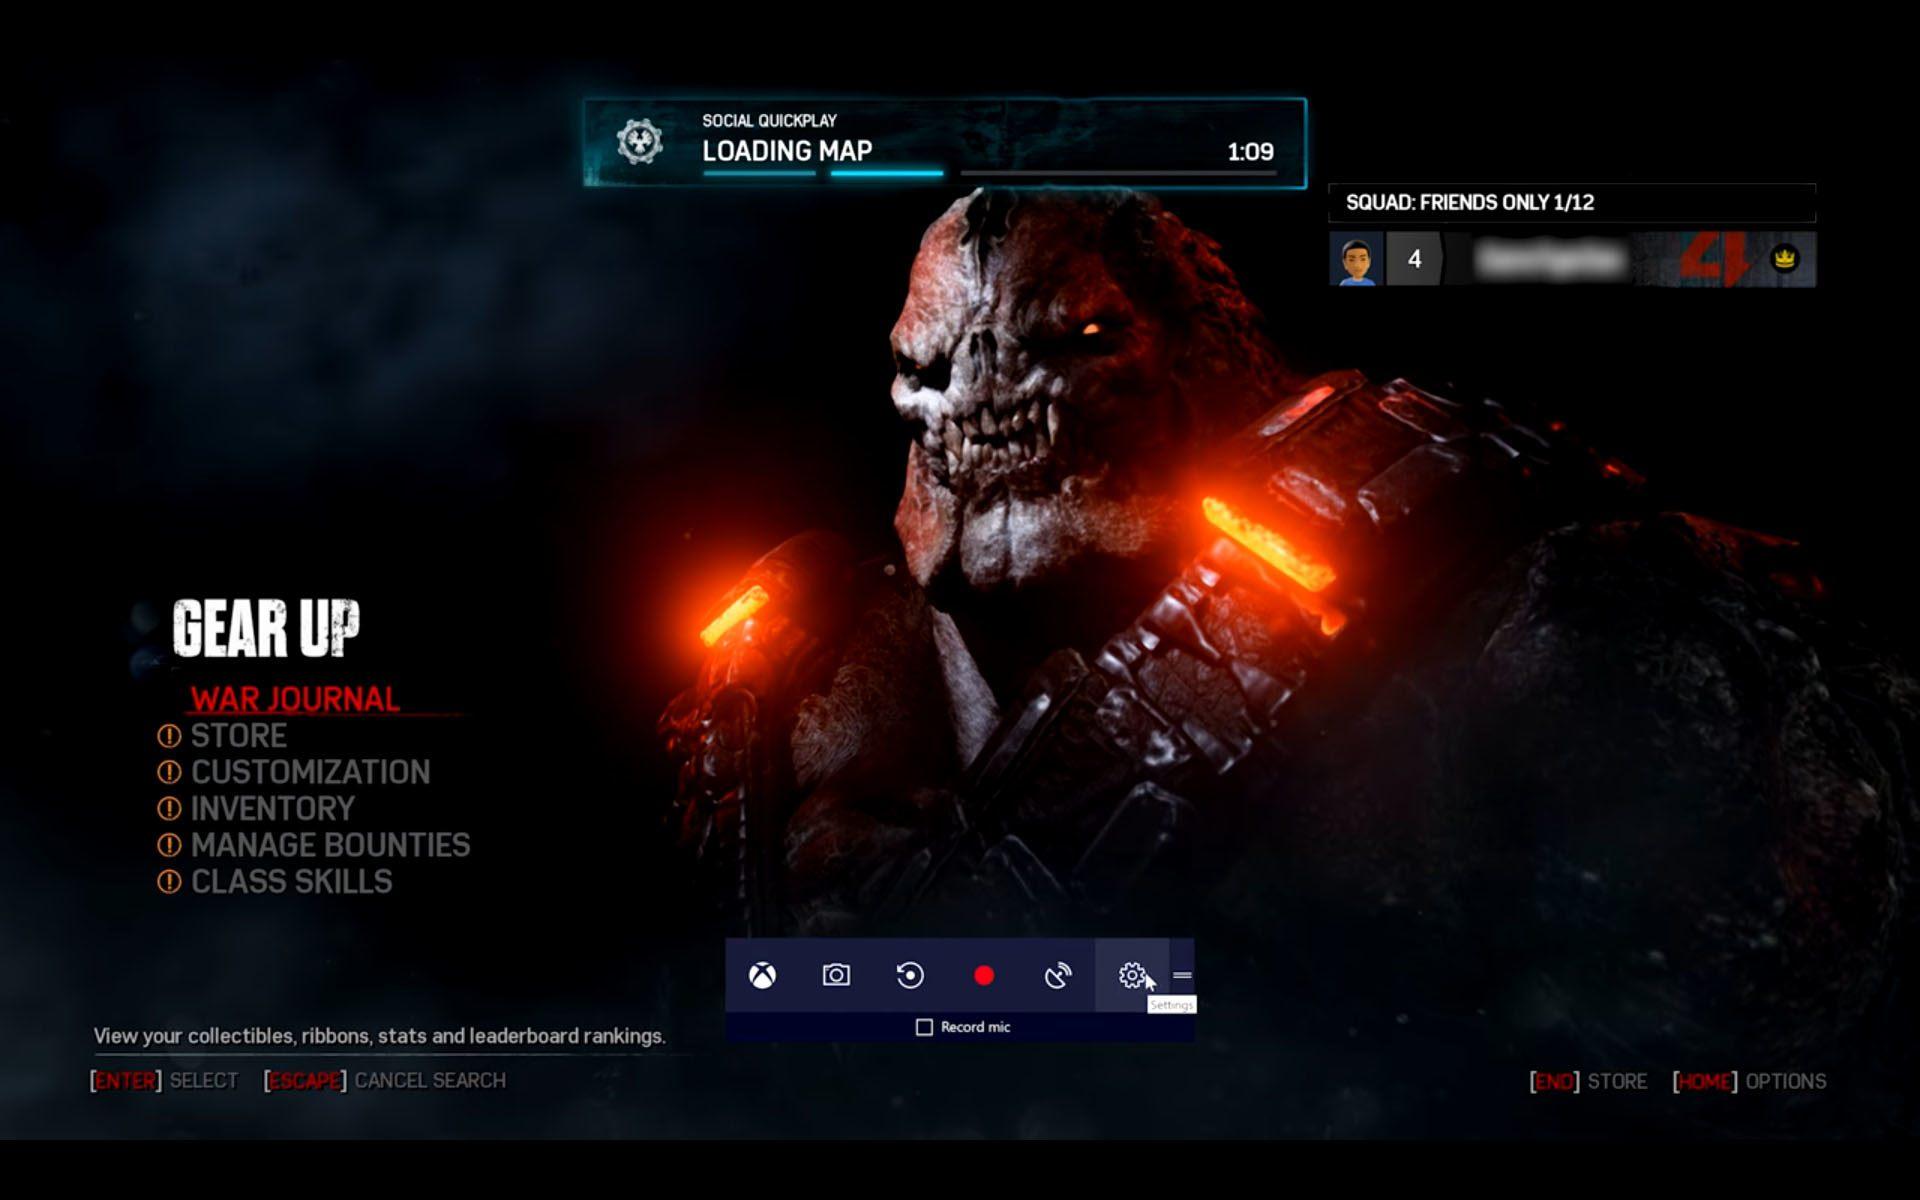 Gam Untuk Wallpaper - Gears Of War 4 Matchmaking - HD Wallpaper